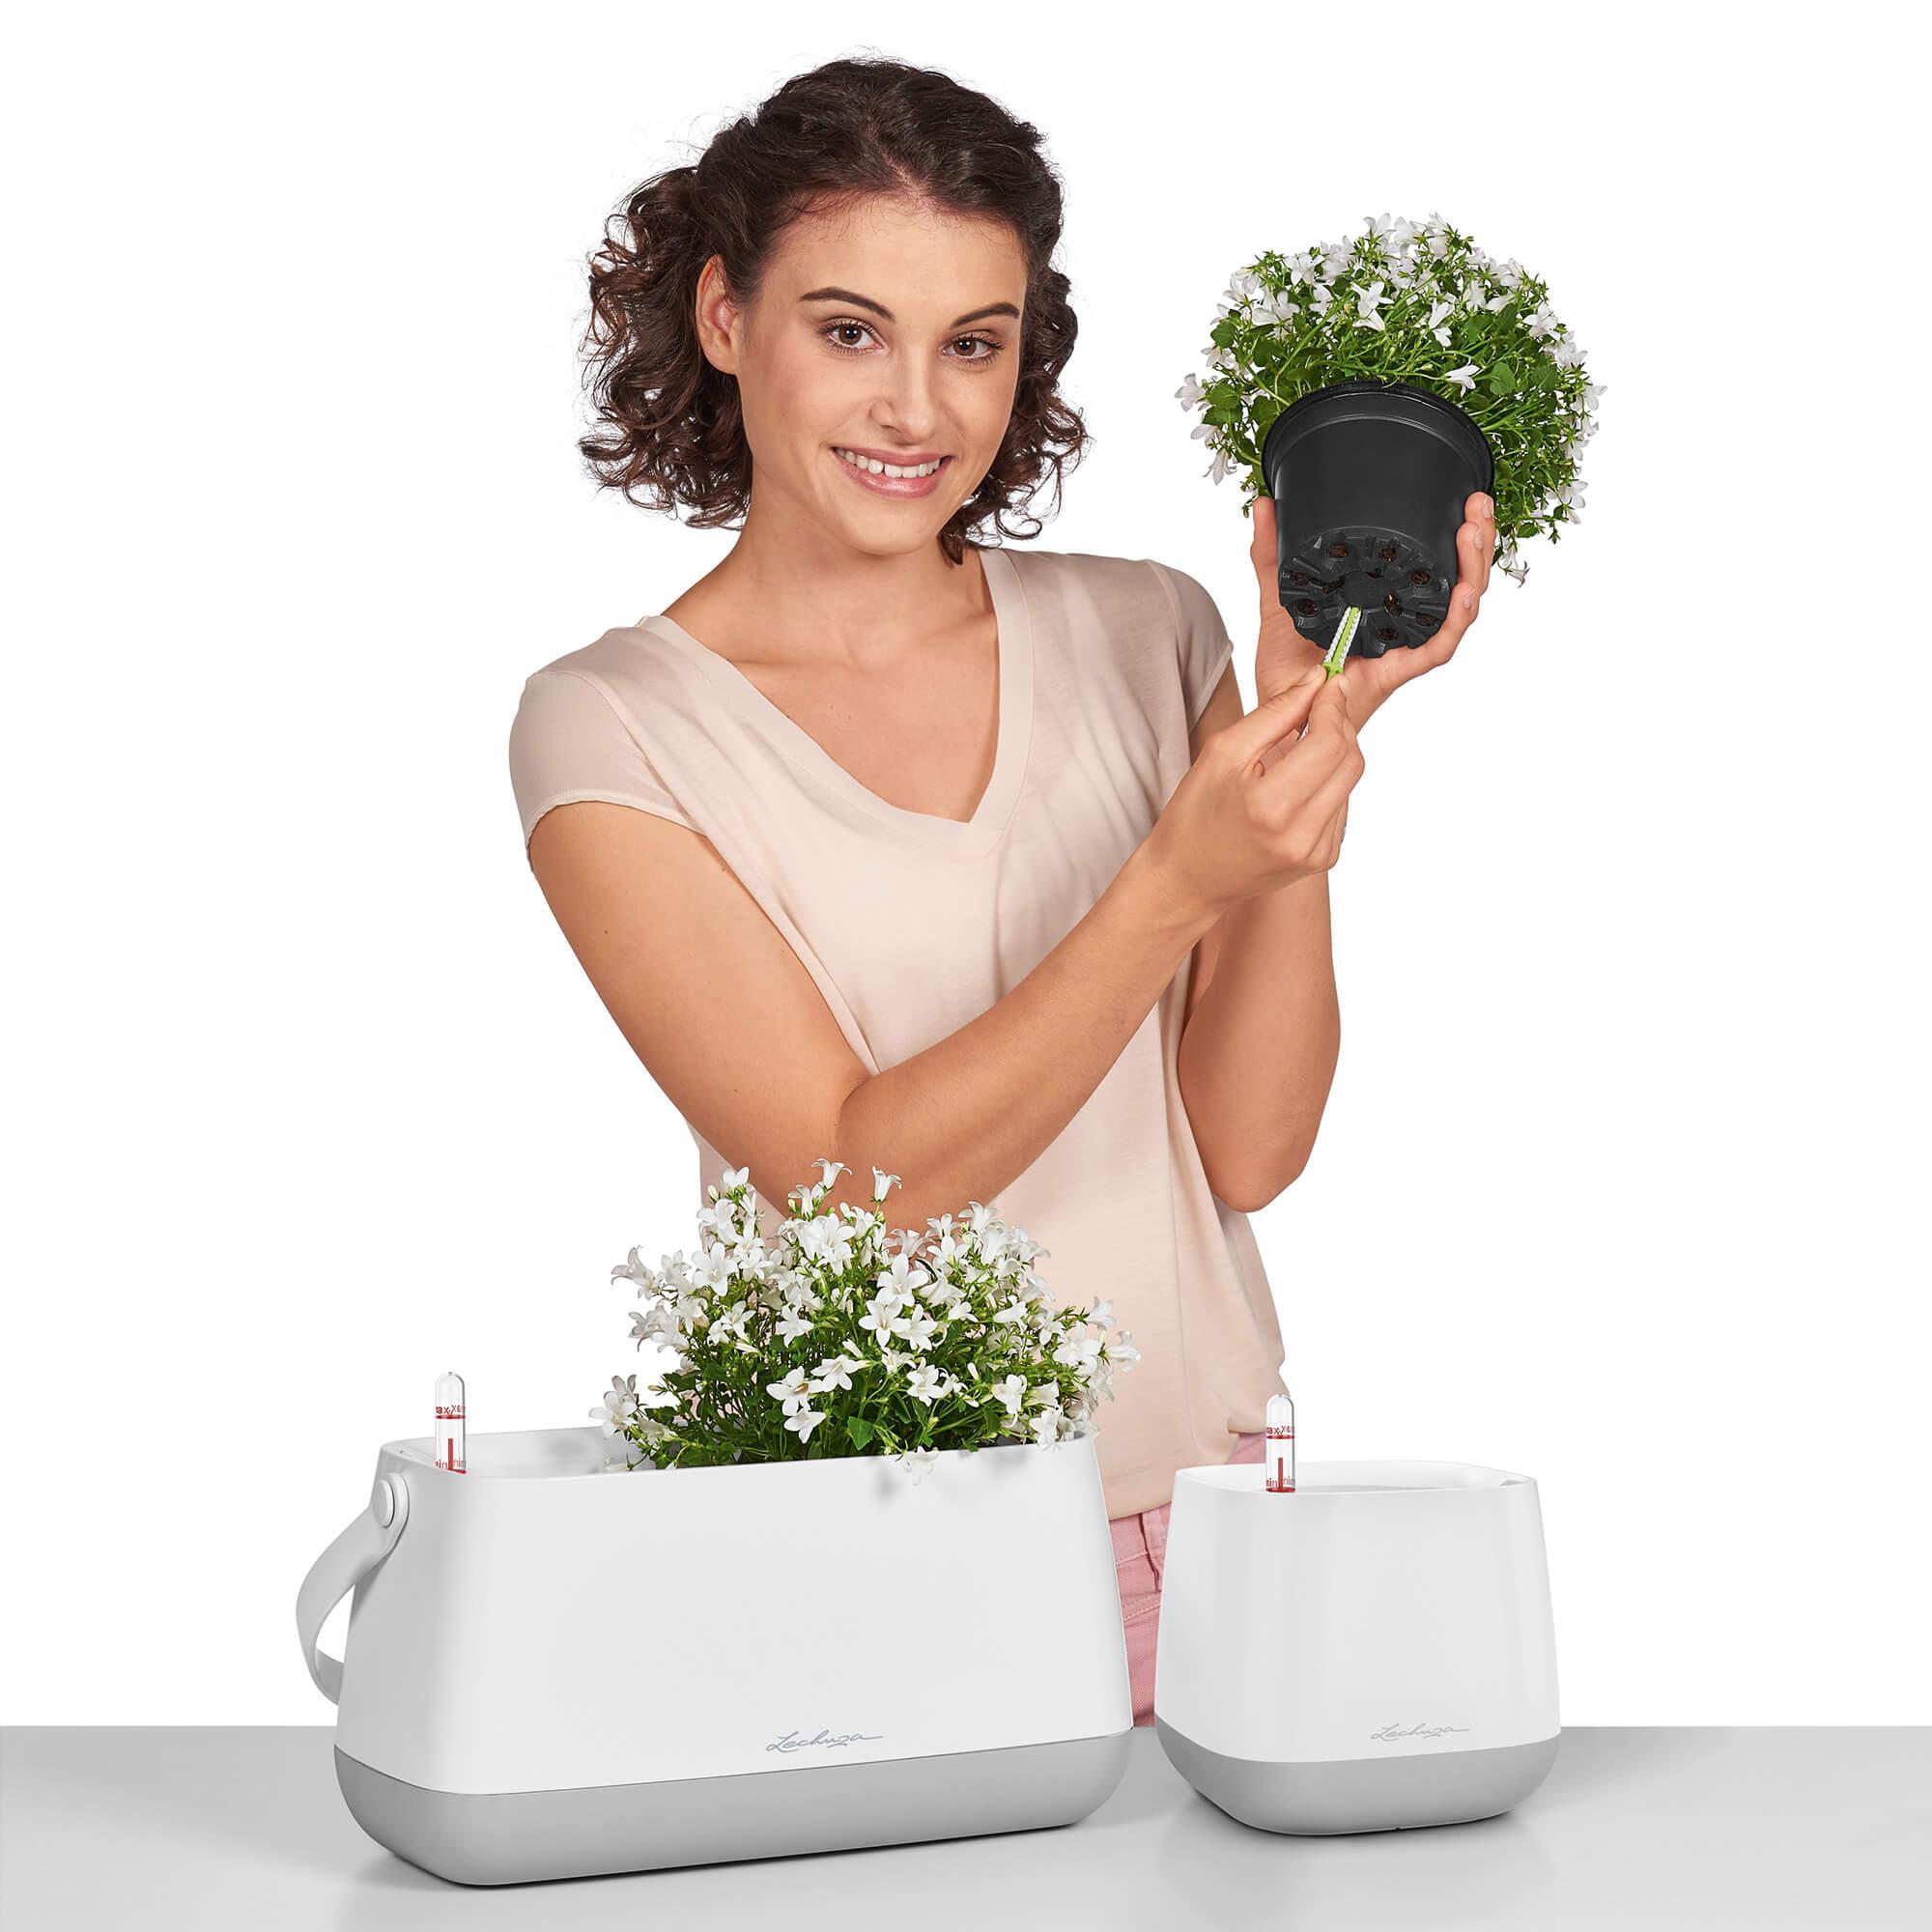 YULA plant bag white/gray semi-gloss - Image 4